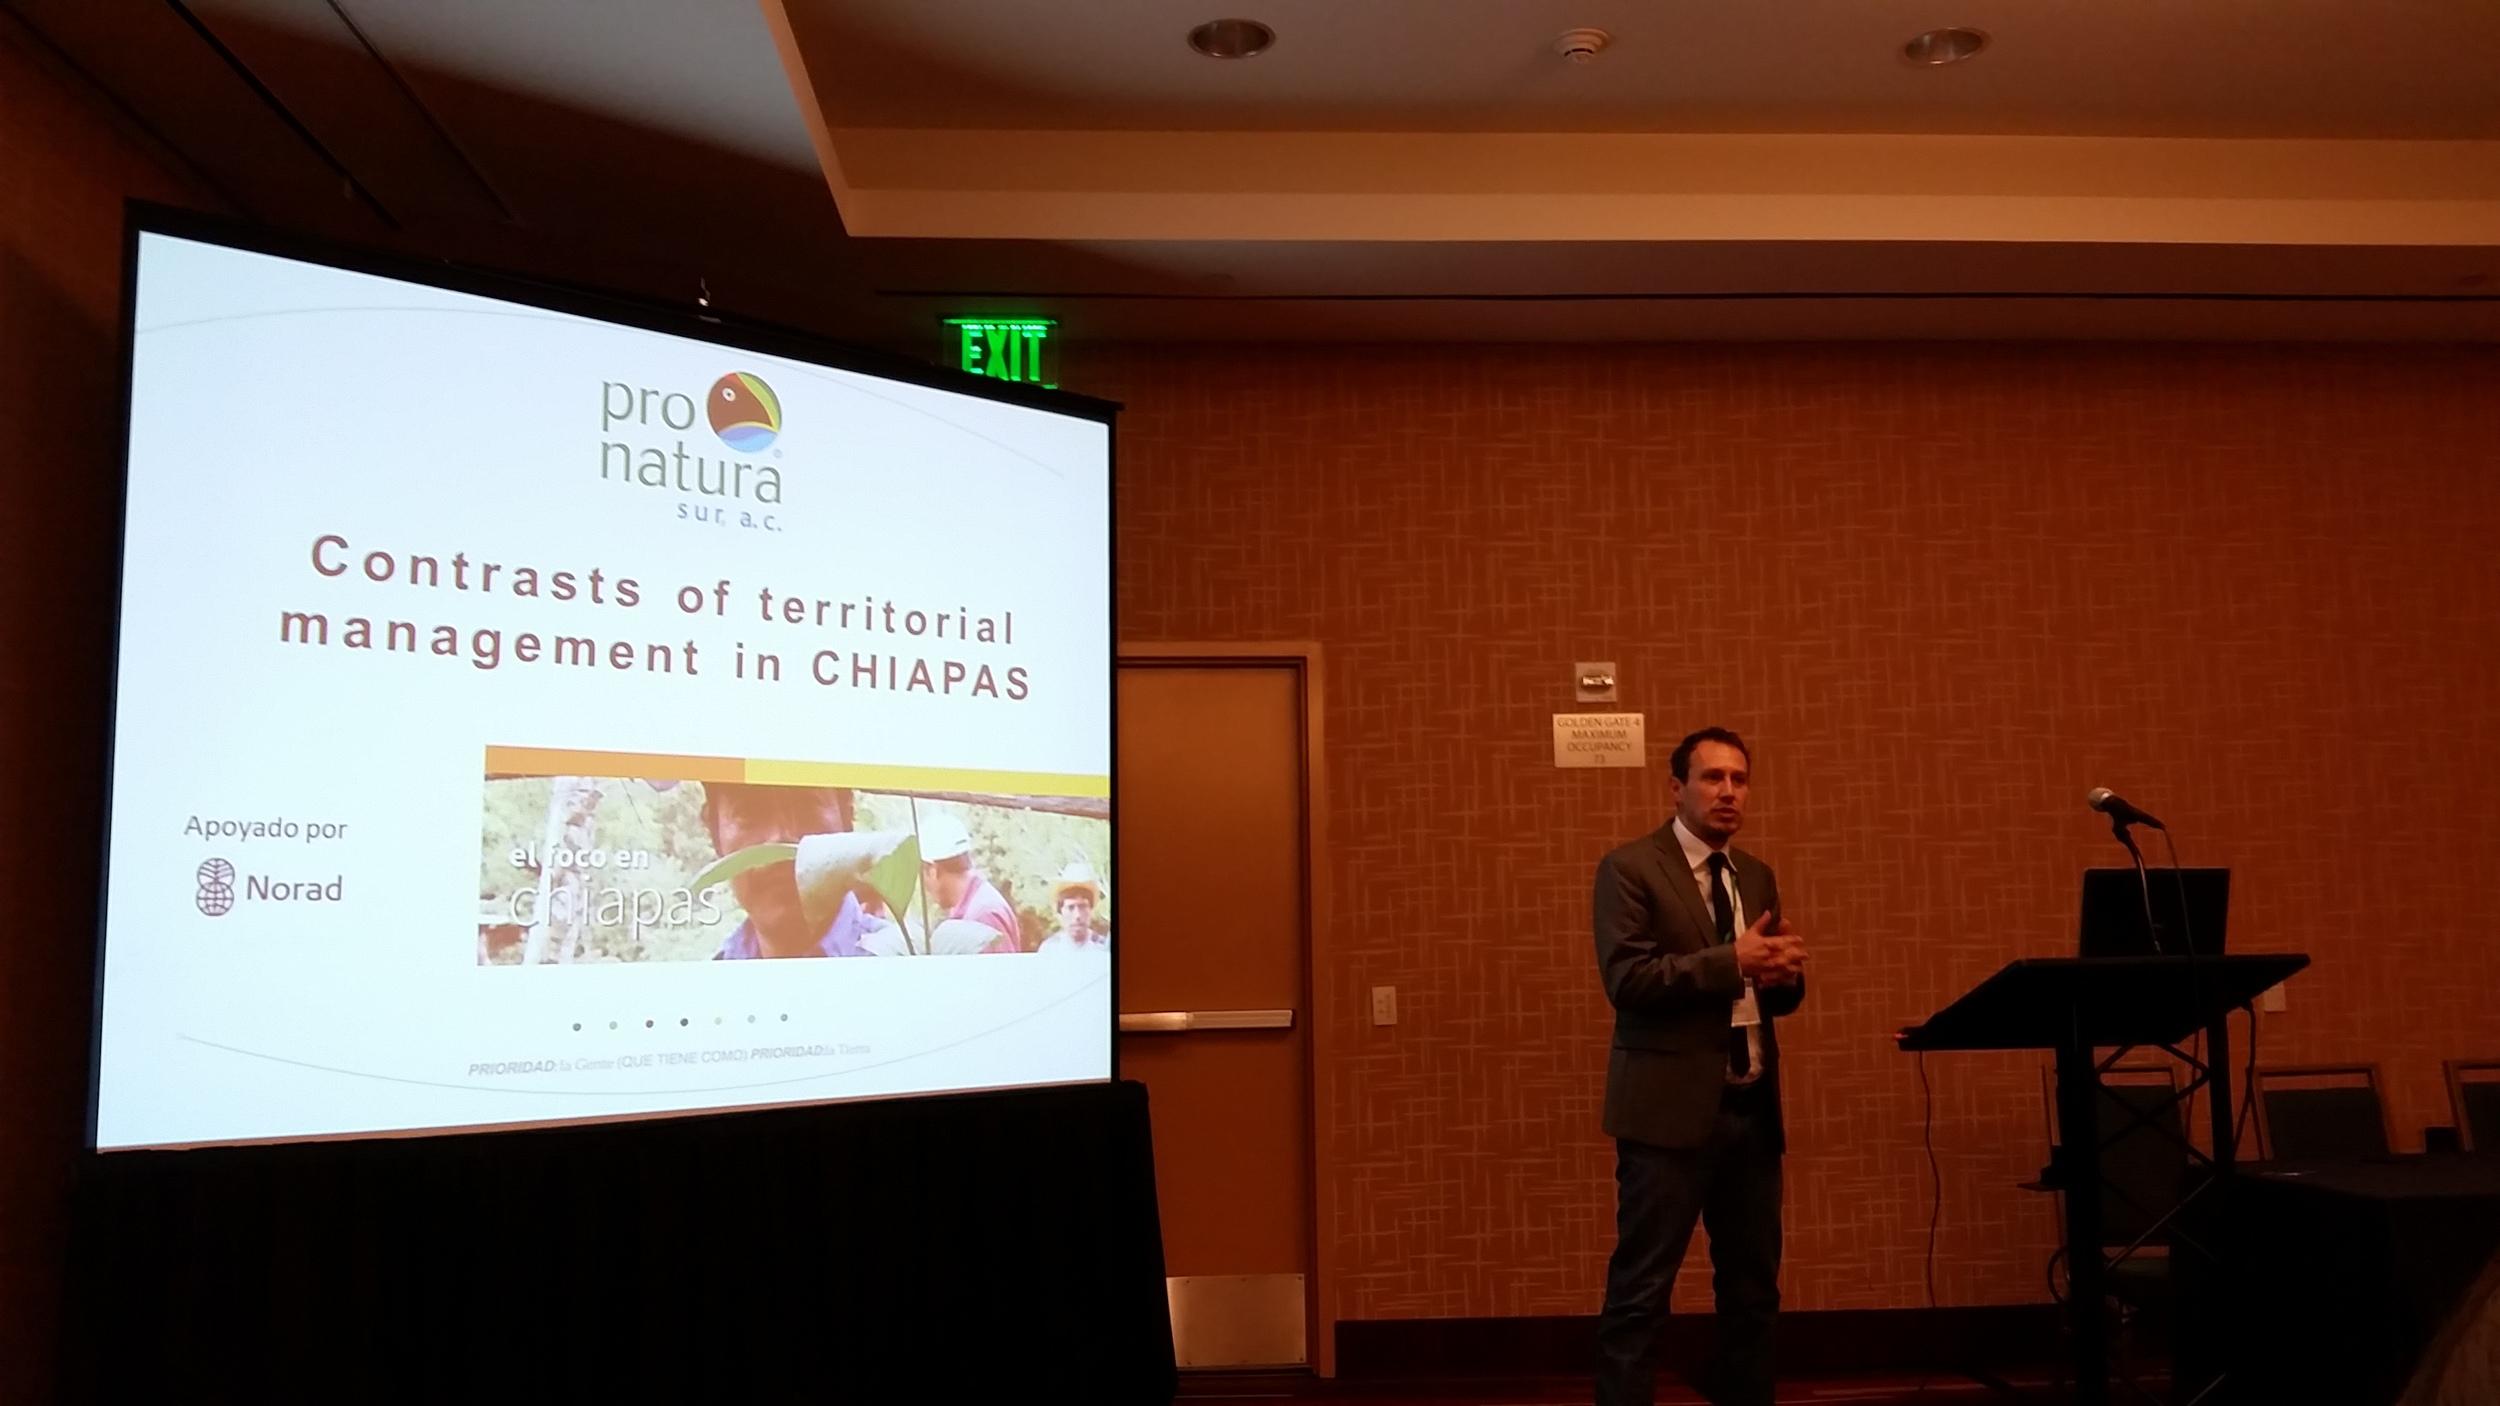 Pepe Montero (Pronatura Sur) discusses the progress made in Chiapas, Mexico on landscape sustainability